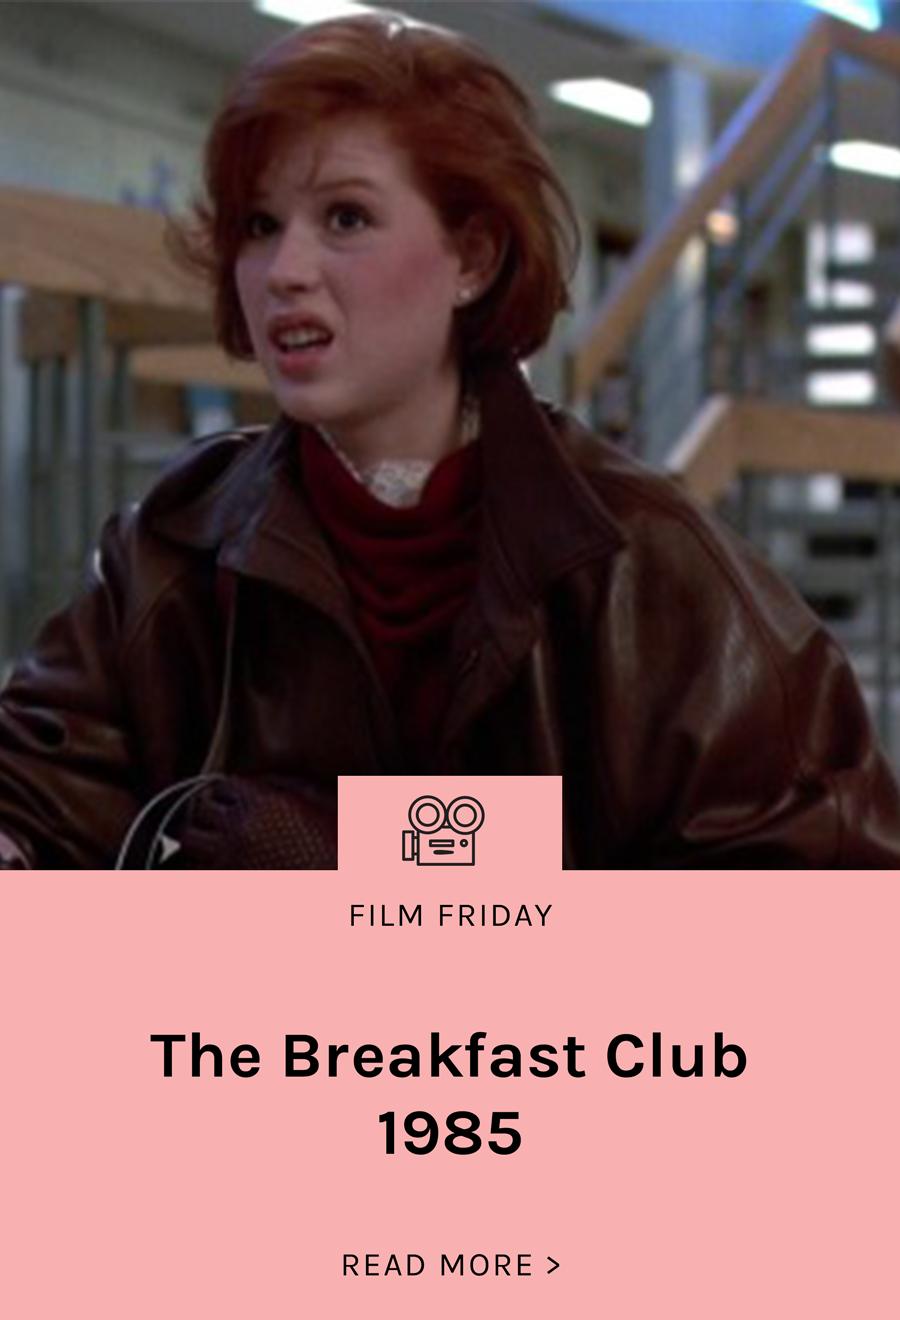 FilmFriday-BlogLanding_LSG_BREAKFAST_CLUB (1).png